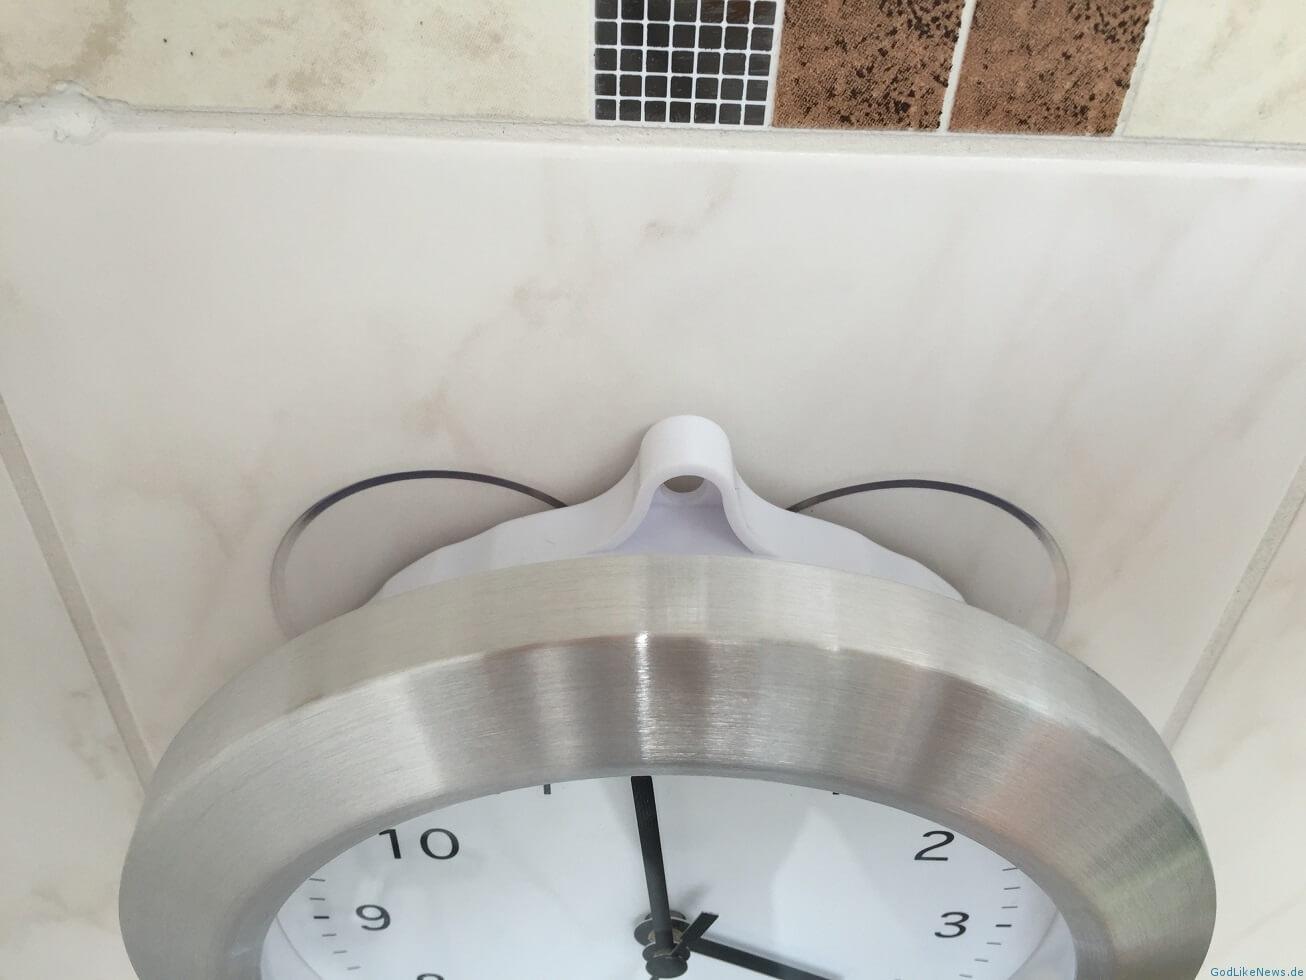 badezimmeruhr mit saugnapf & thermometer - review | godlikenews.de, Hause ideen